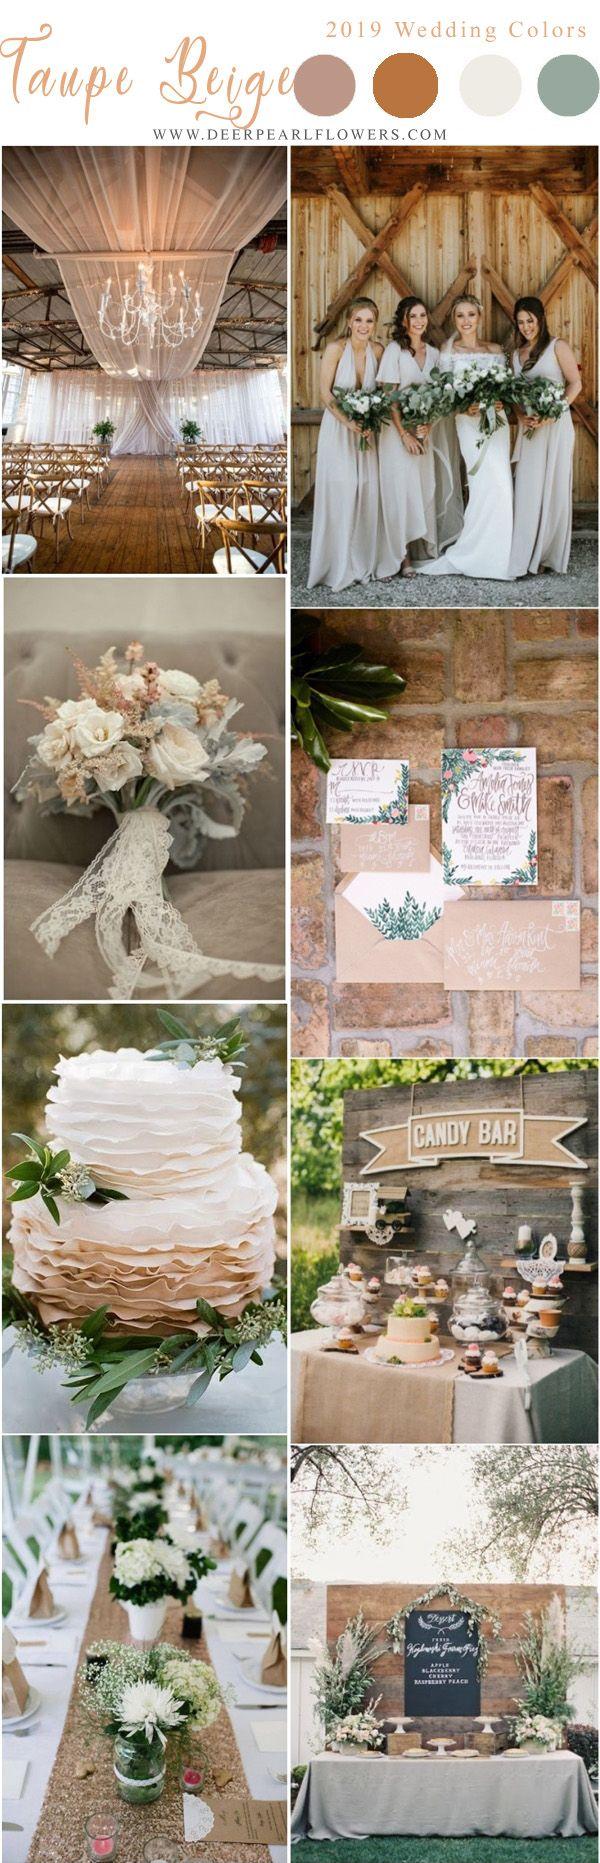 Wedding decorations queenstown october 2018 Top  Wedding Color Scheme Ideas for  Trends  Wedding Ideas